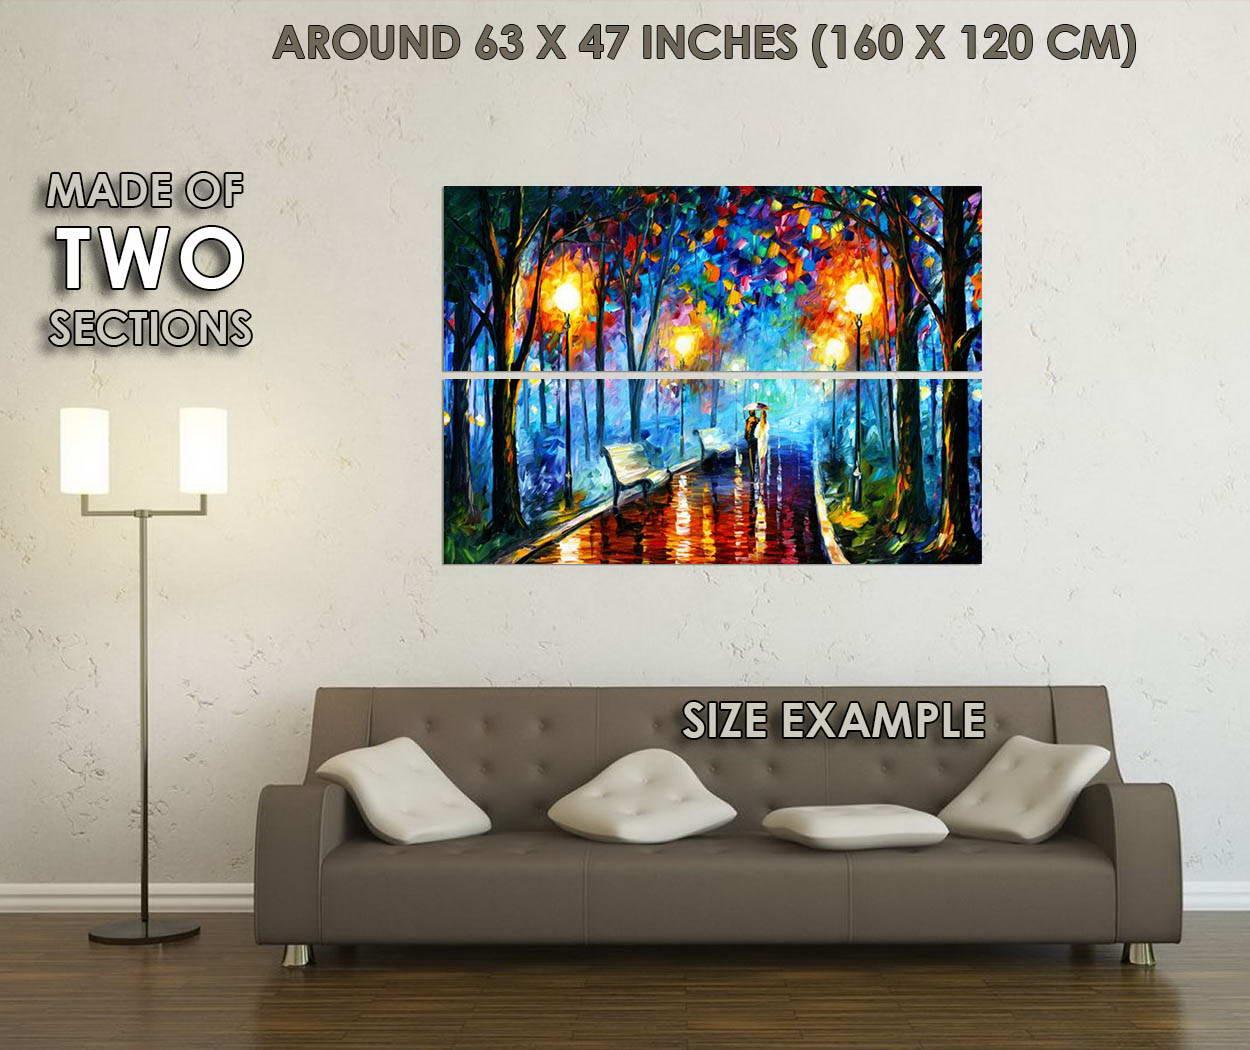 10406-A-Couple-Walking-in-Rain-Abstract-Art-LAMINATED-POSTER-CA thumbnail 6